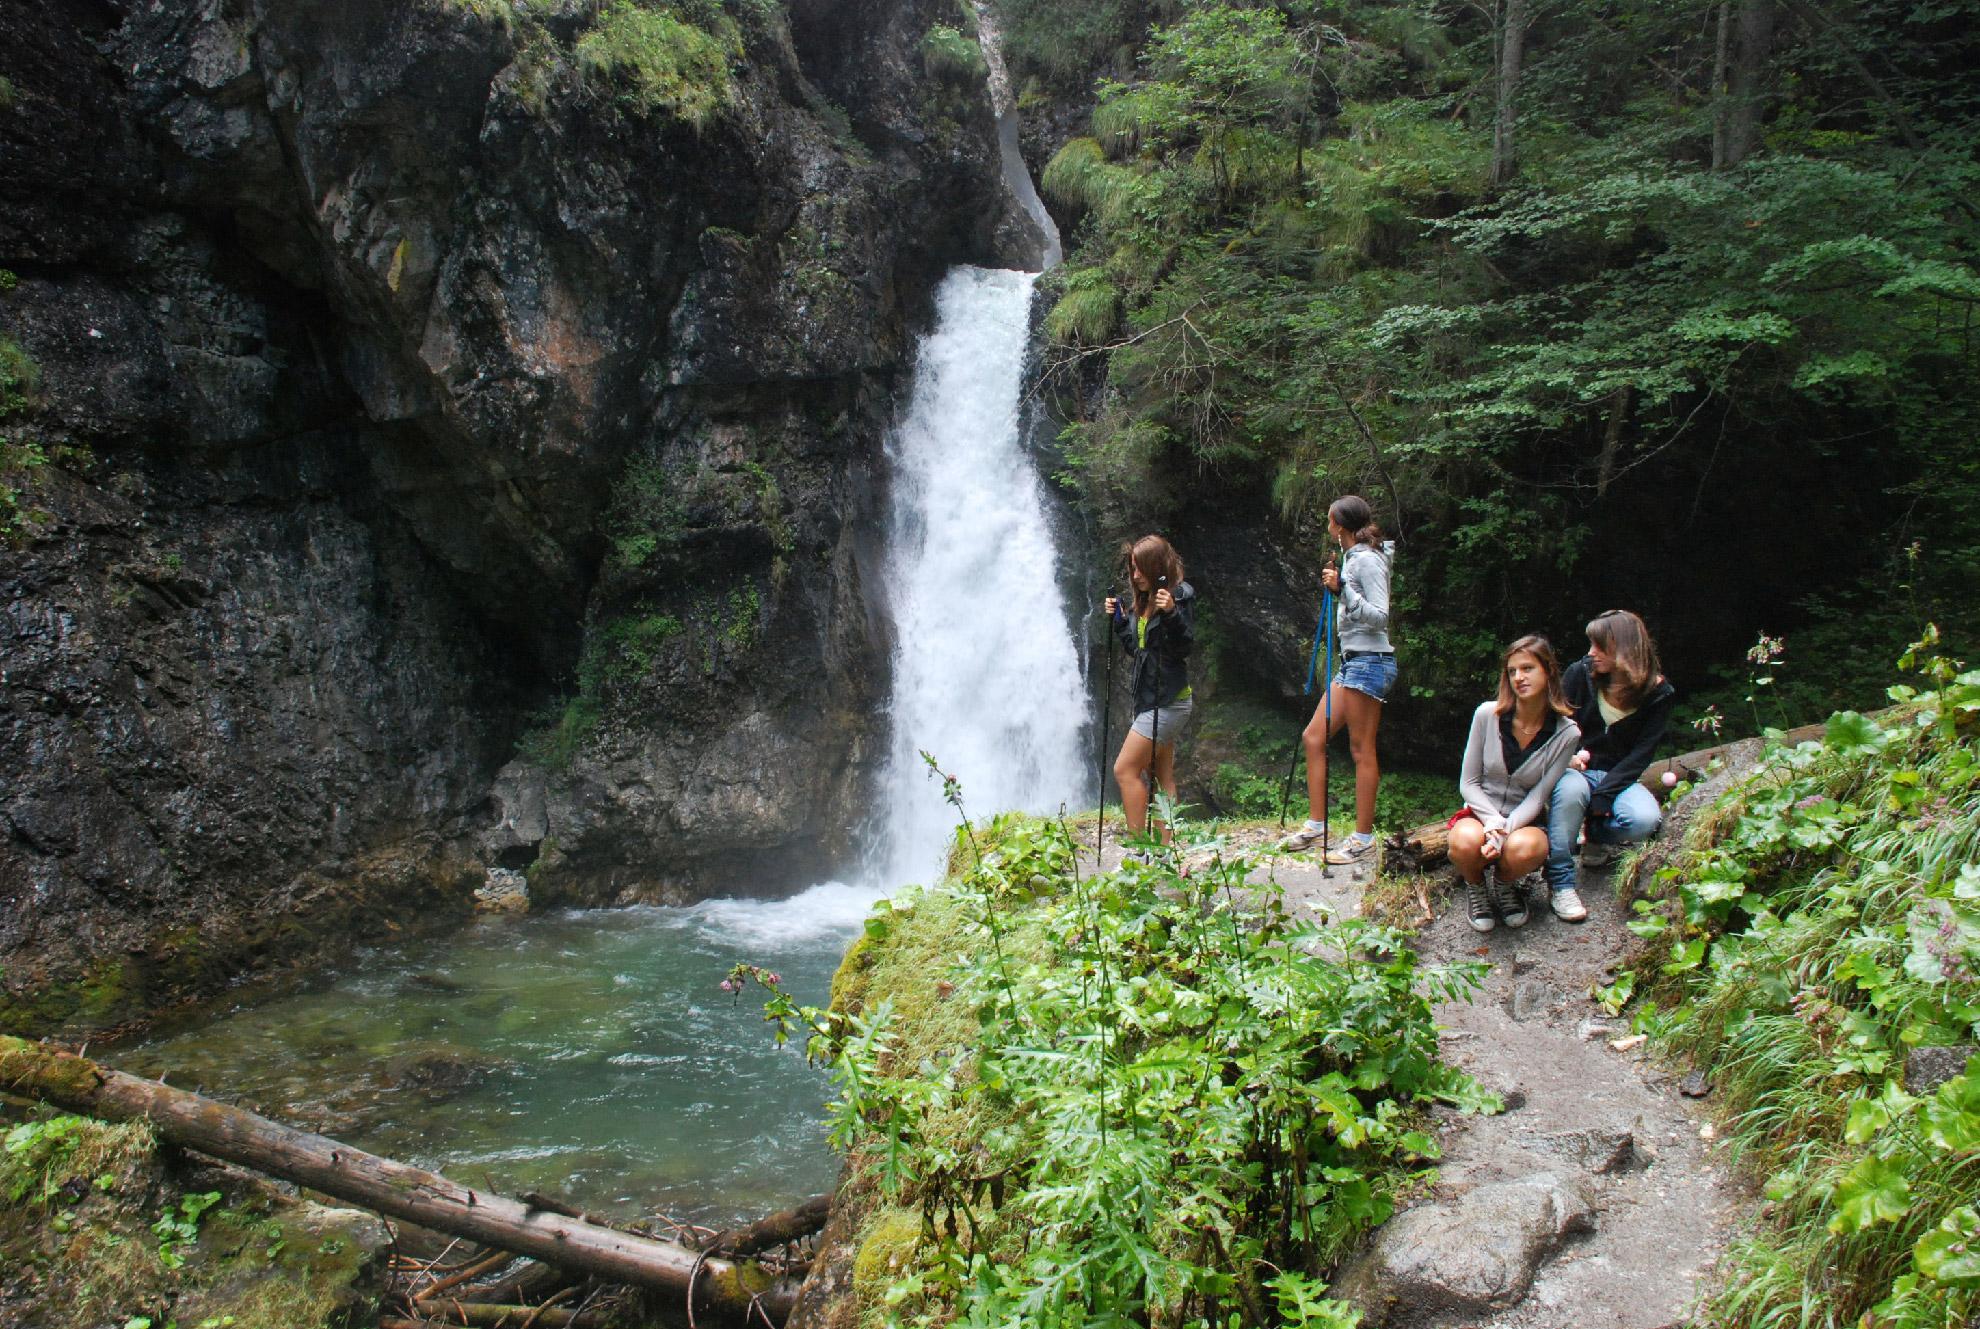 Camminata esperienziale in Val Meledrio